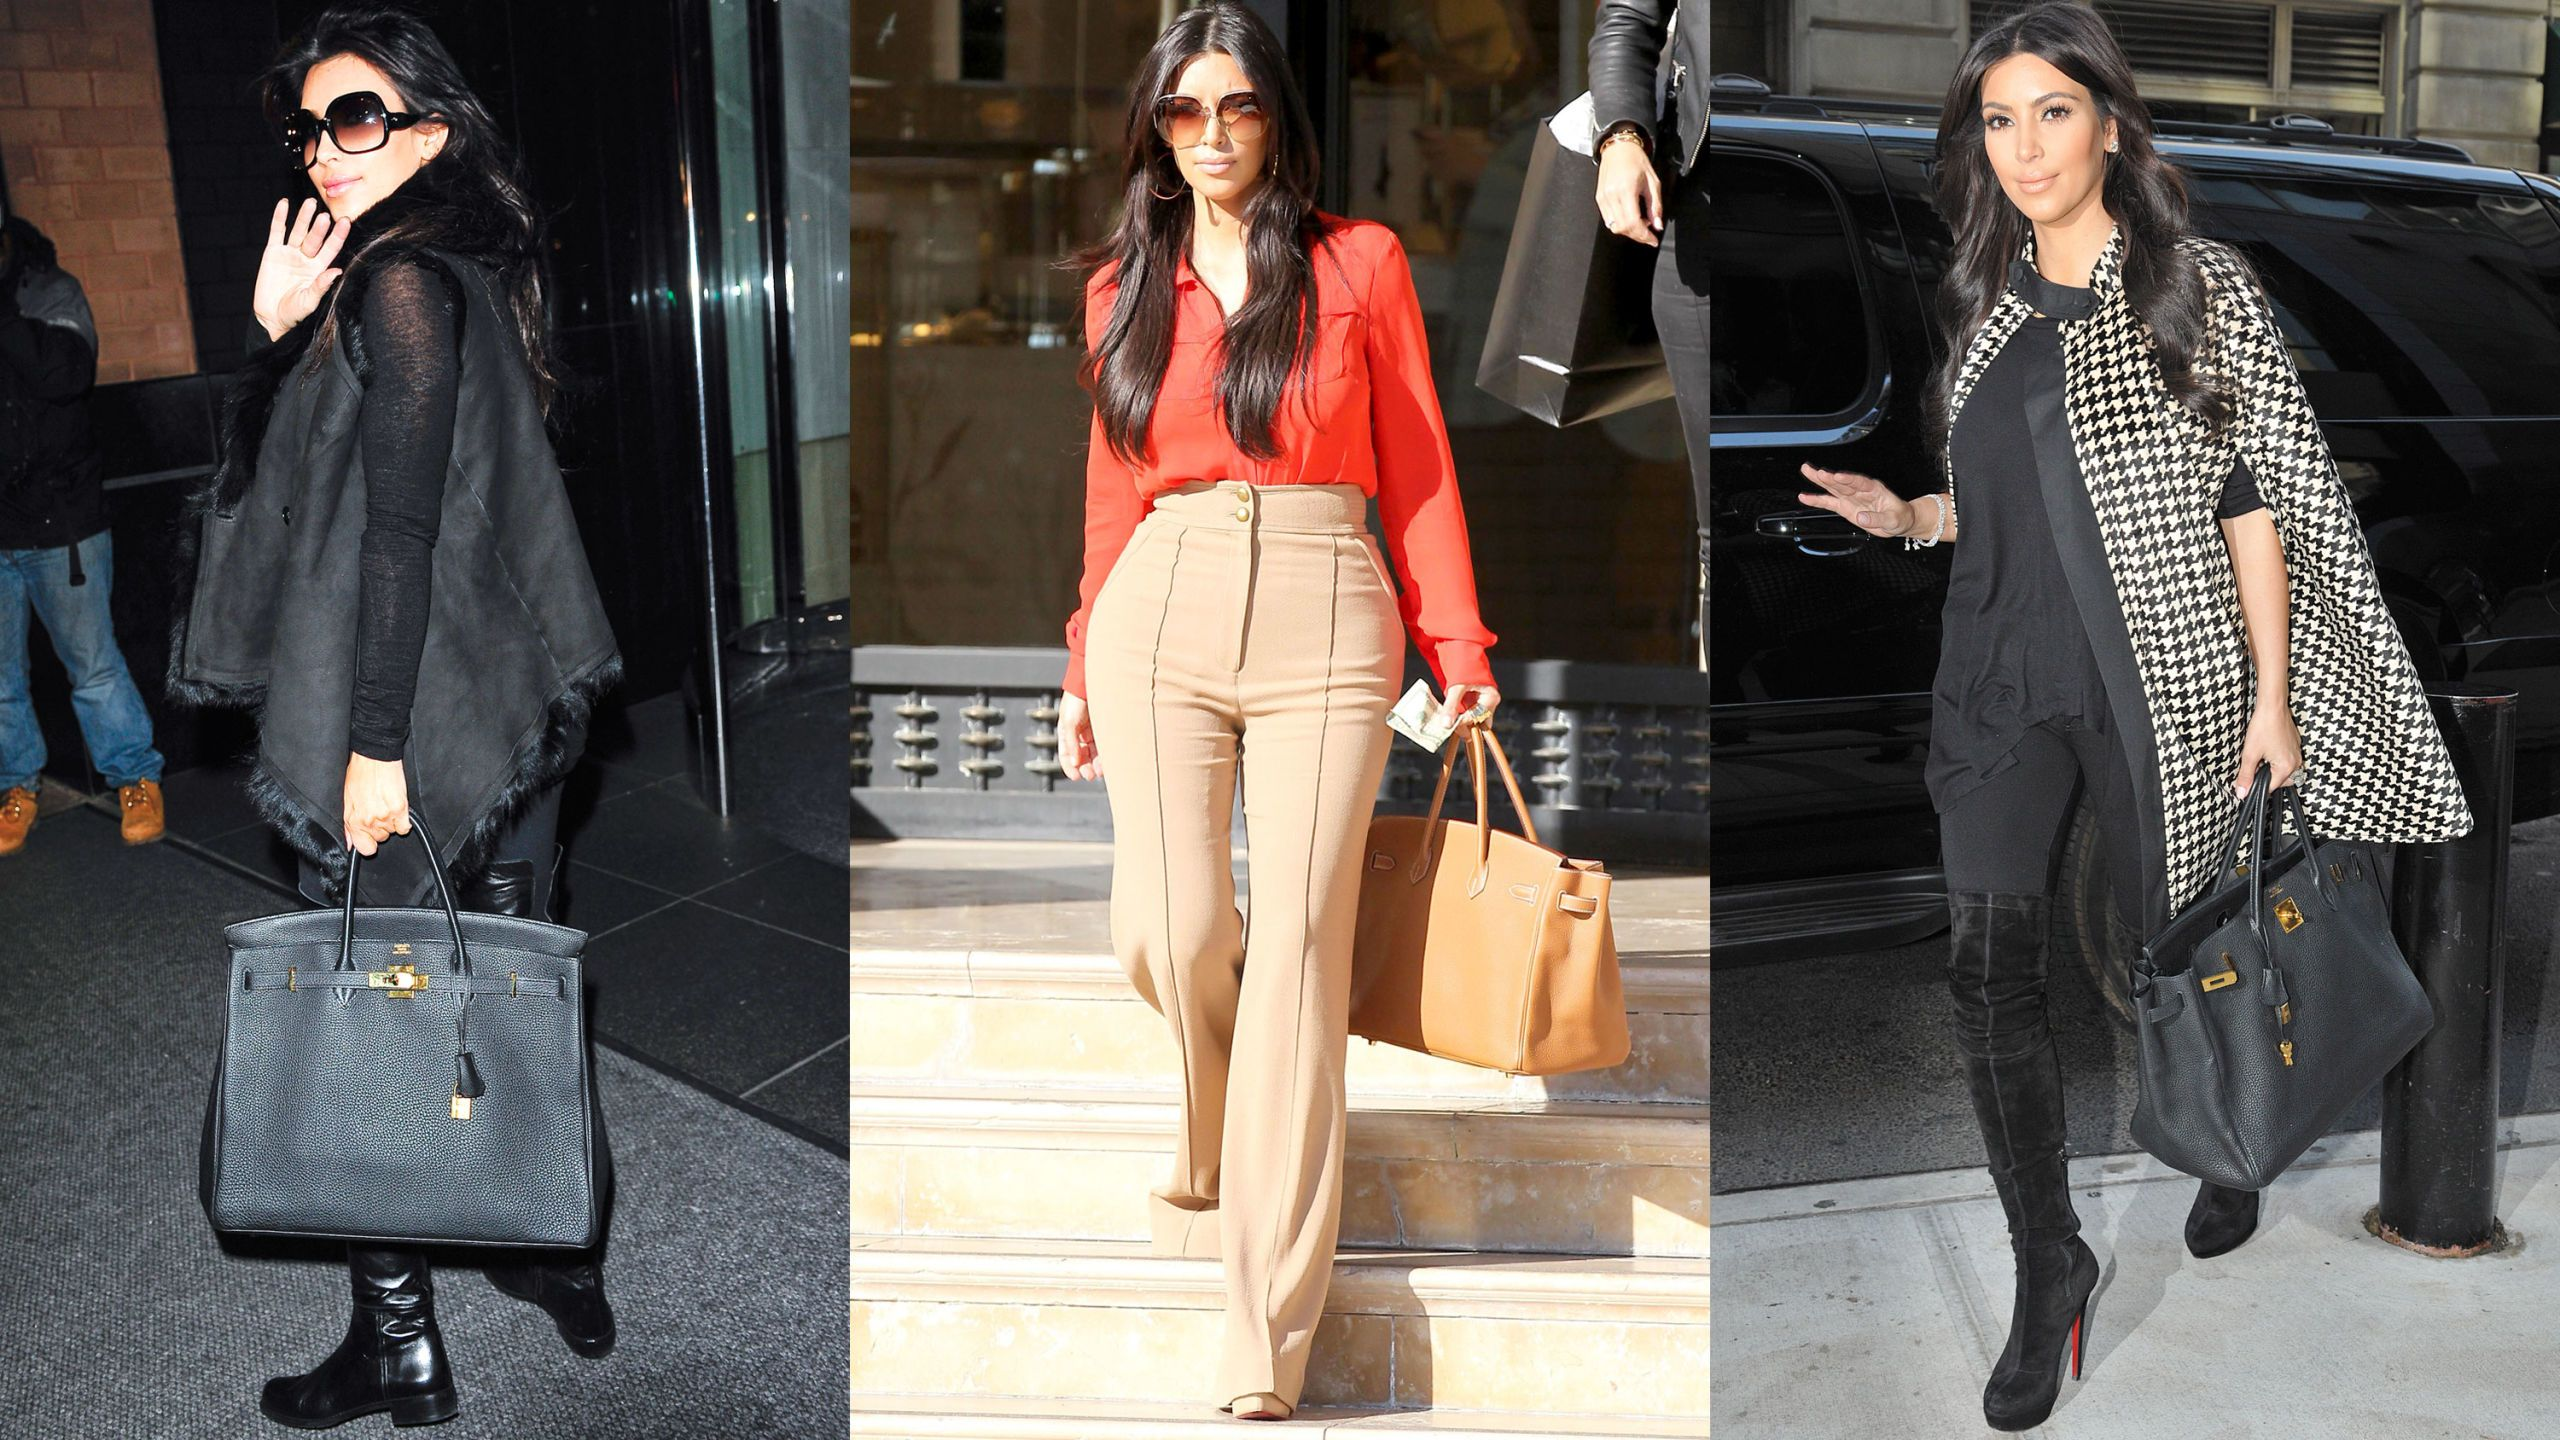 e8ee101f0ecf  theLIST  Hermes Birkin Bags - Celebrities with Birkin Bags